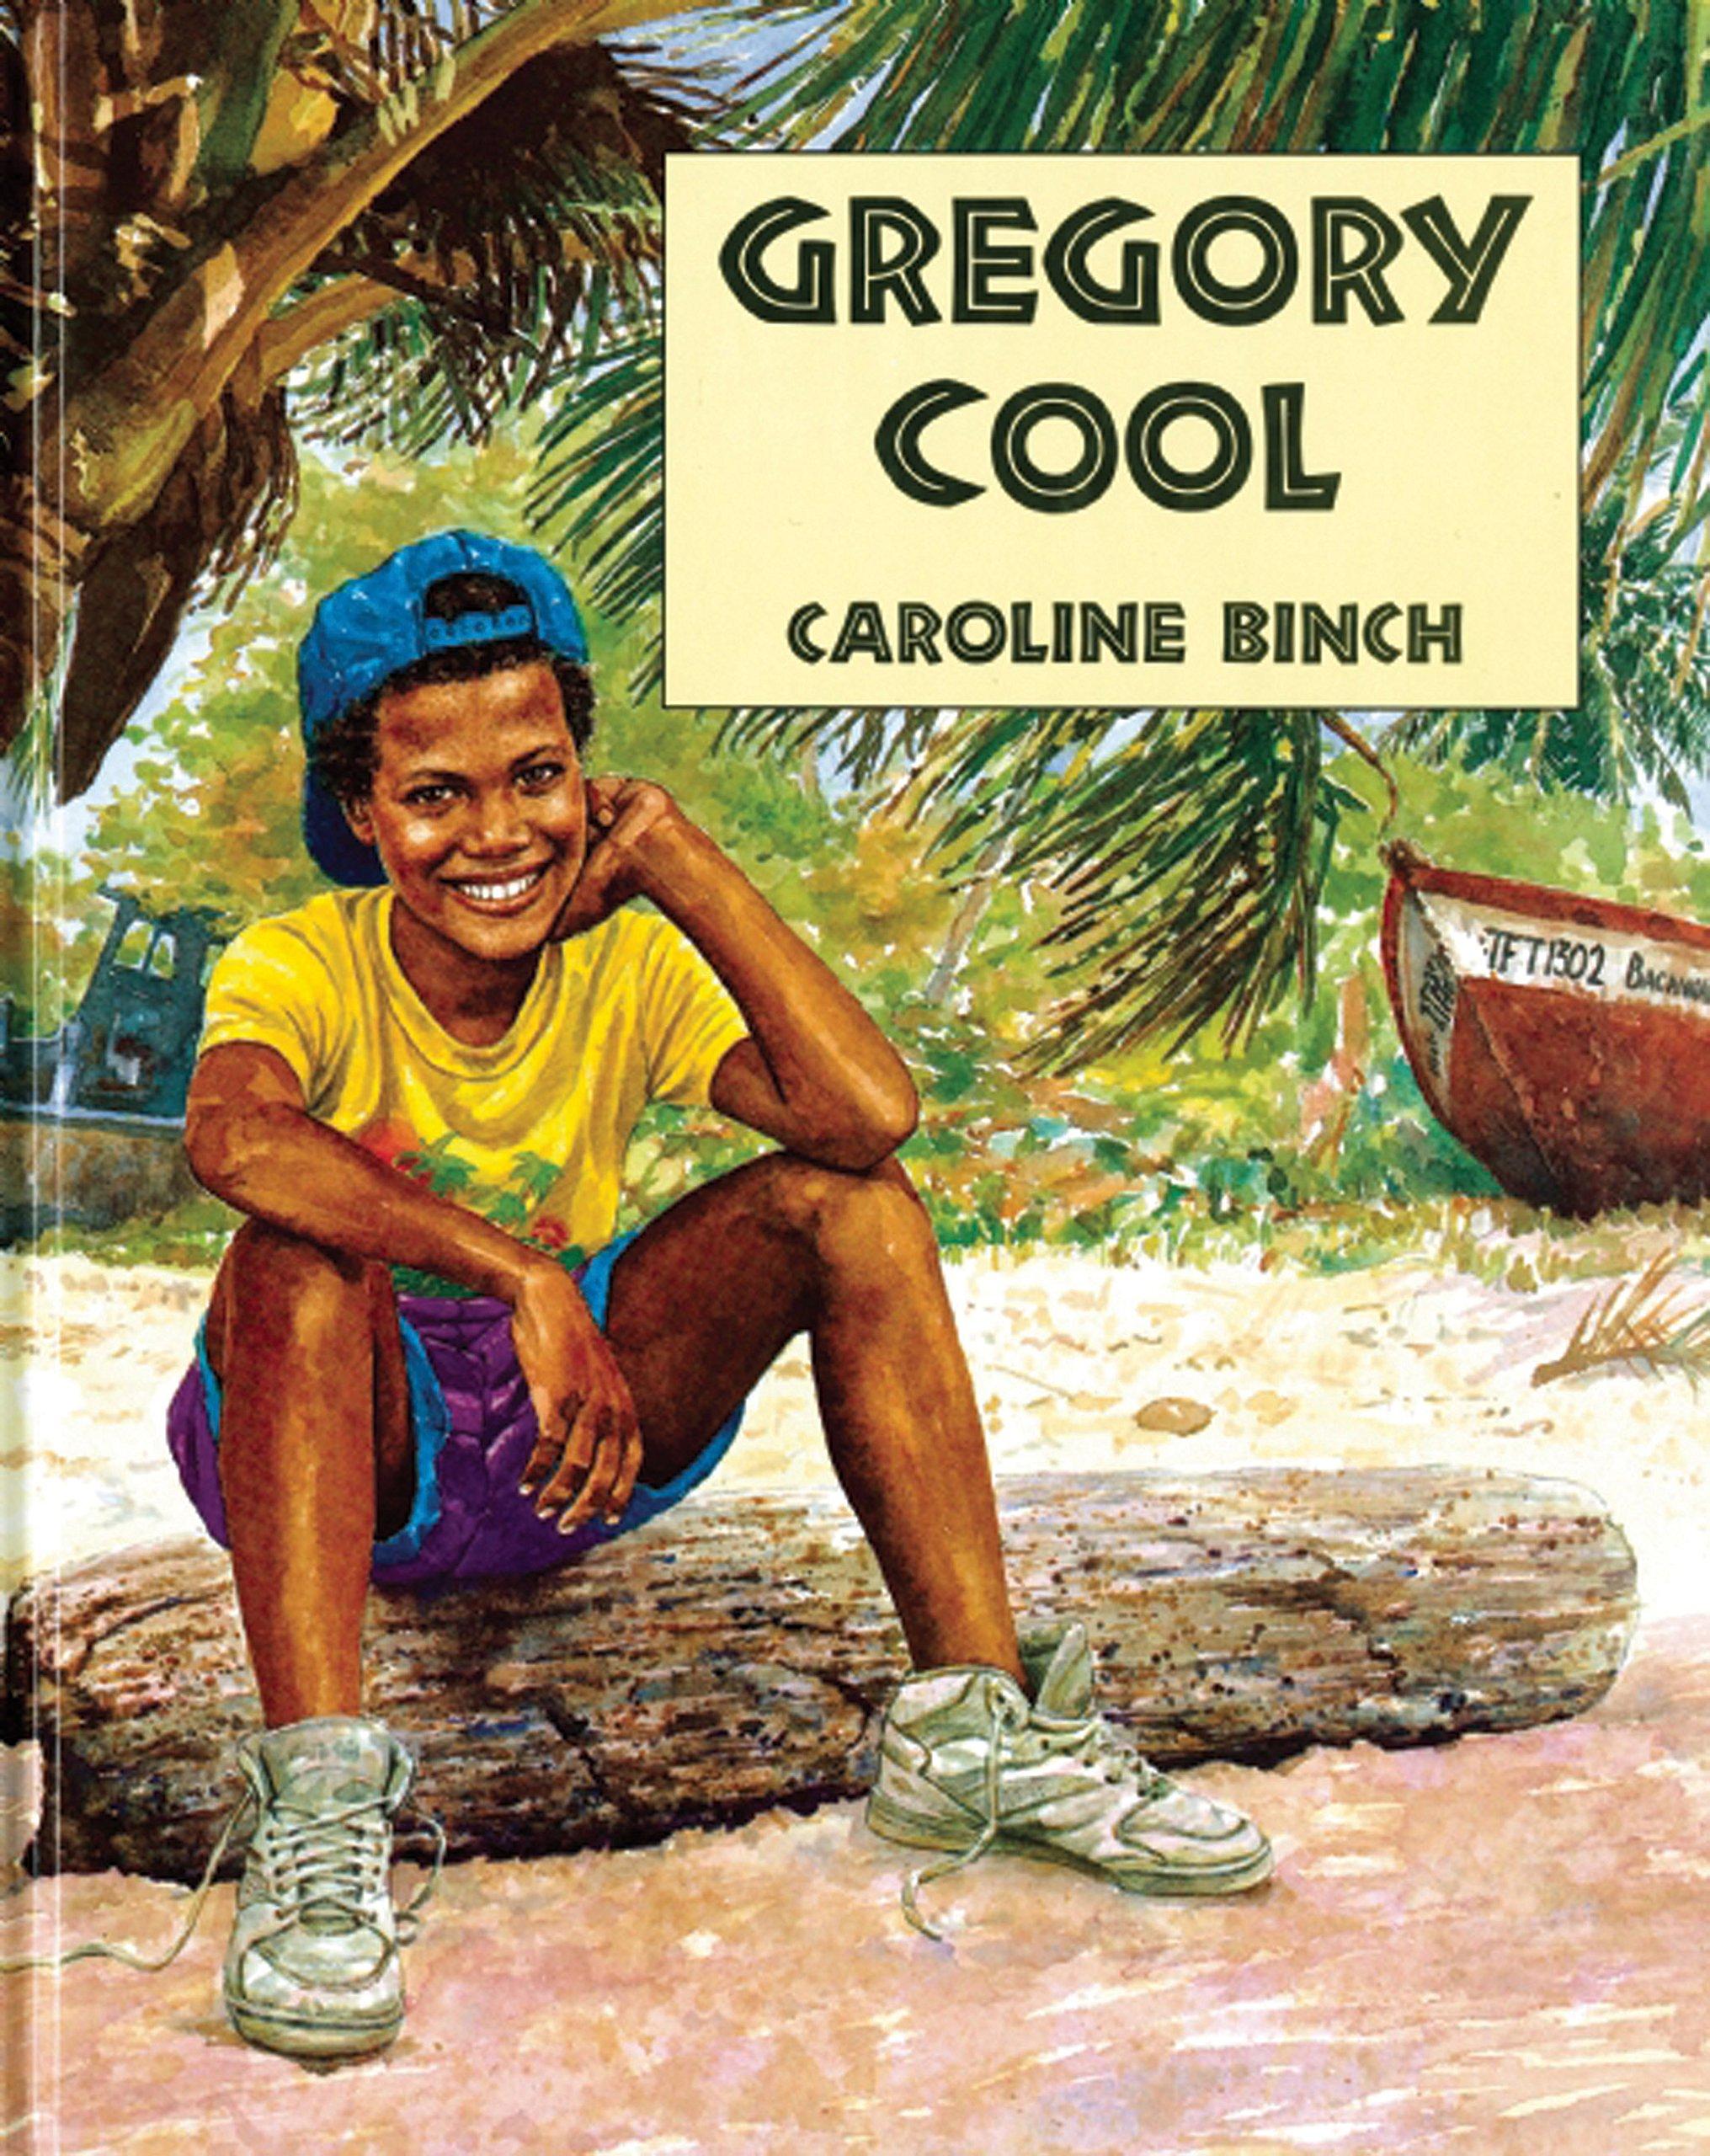 Gregory Cool: Amazon.co.uk: Binch, Caroline: Books